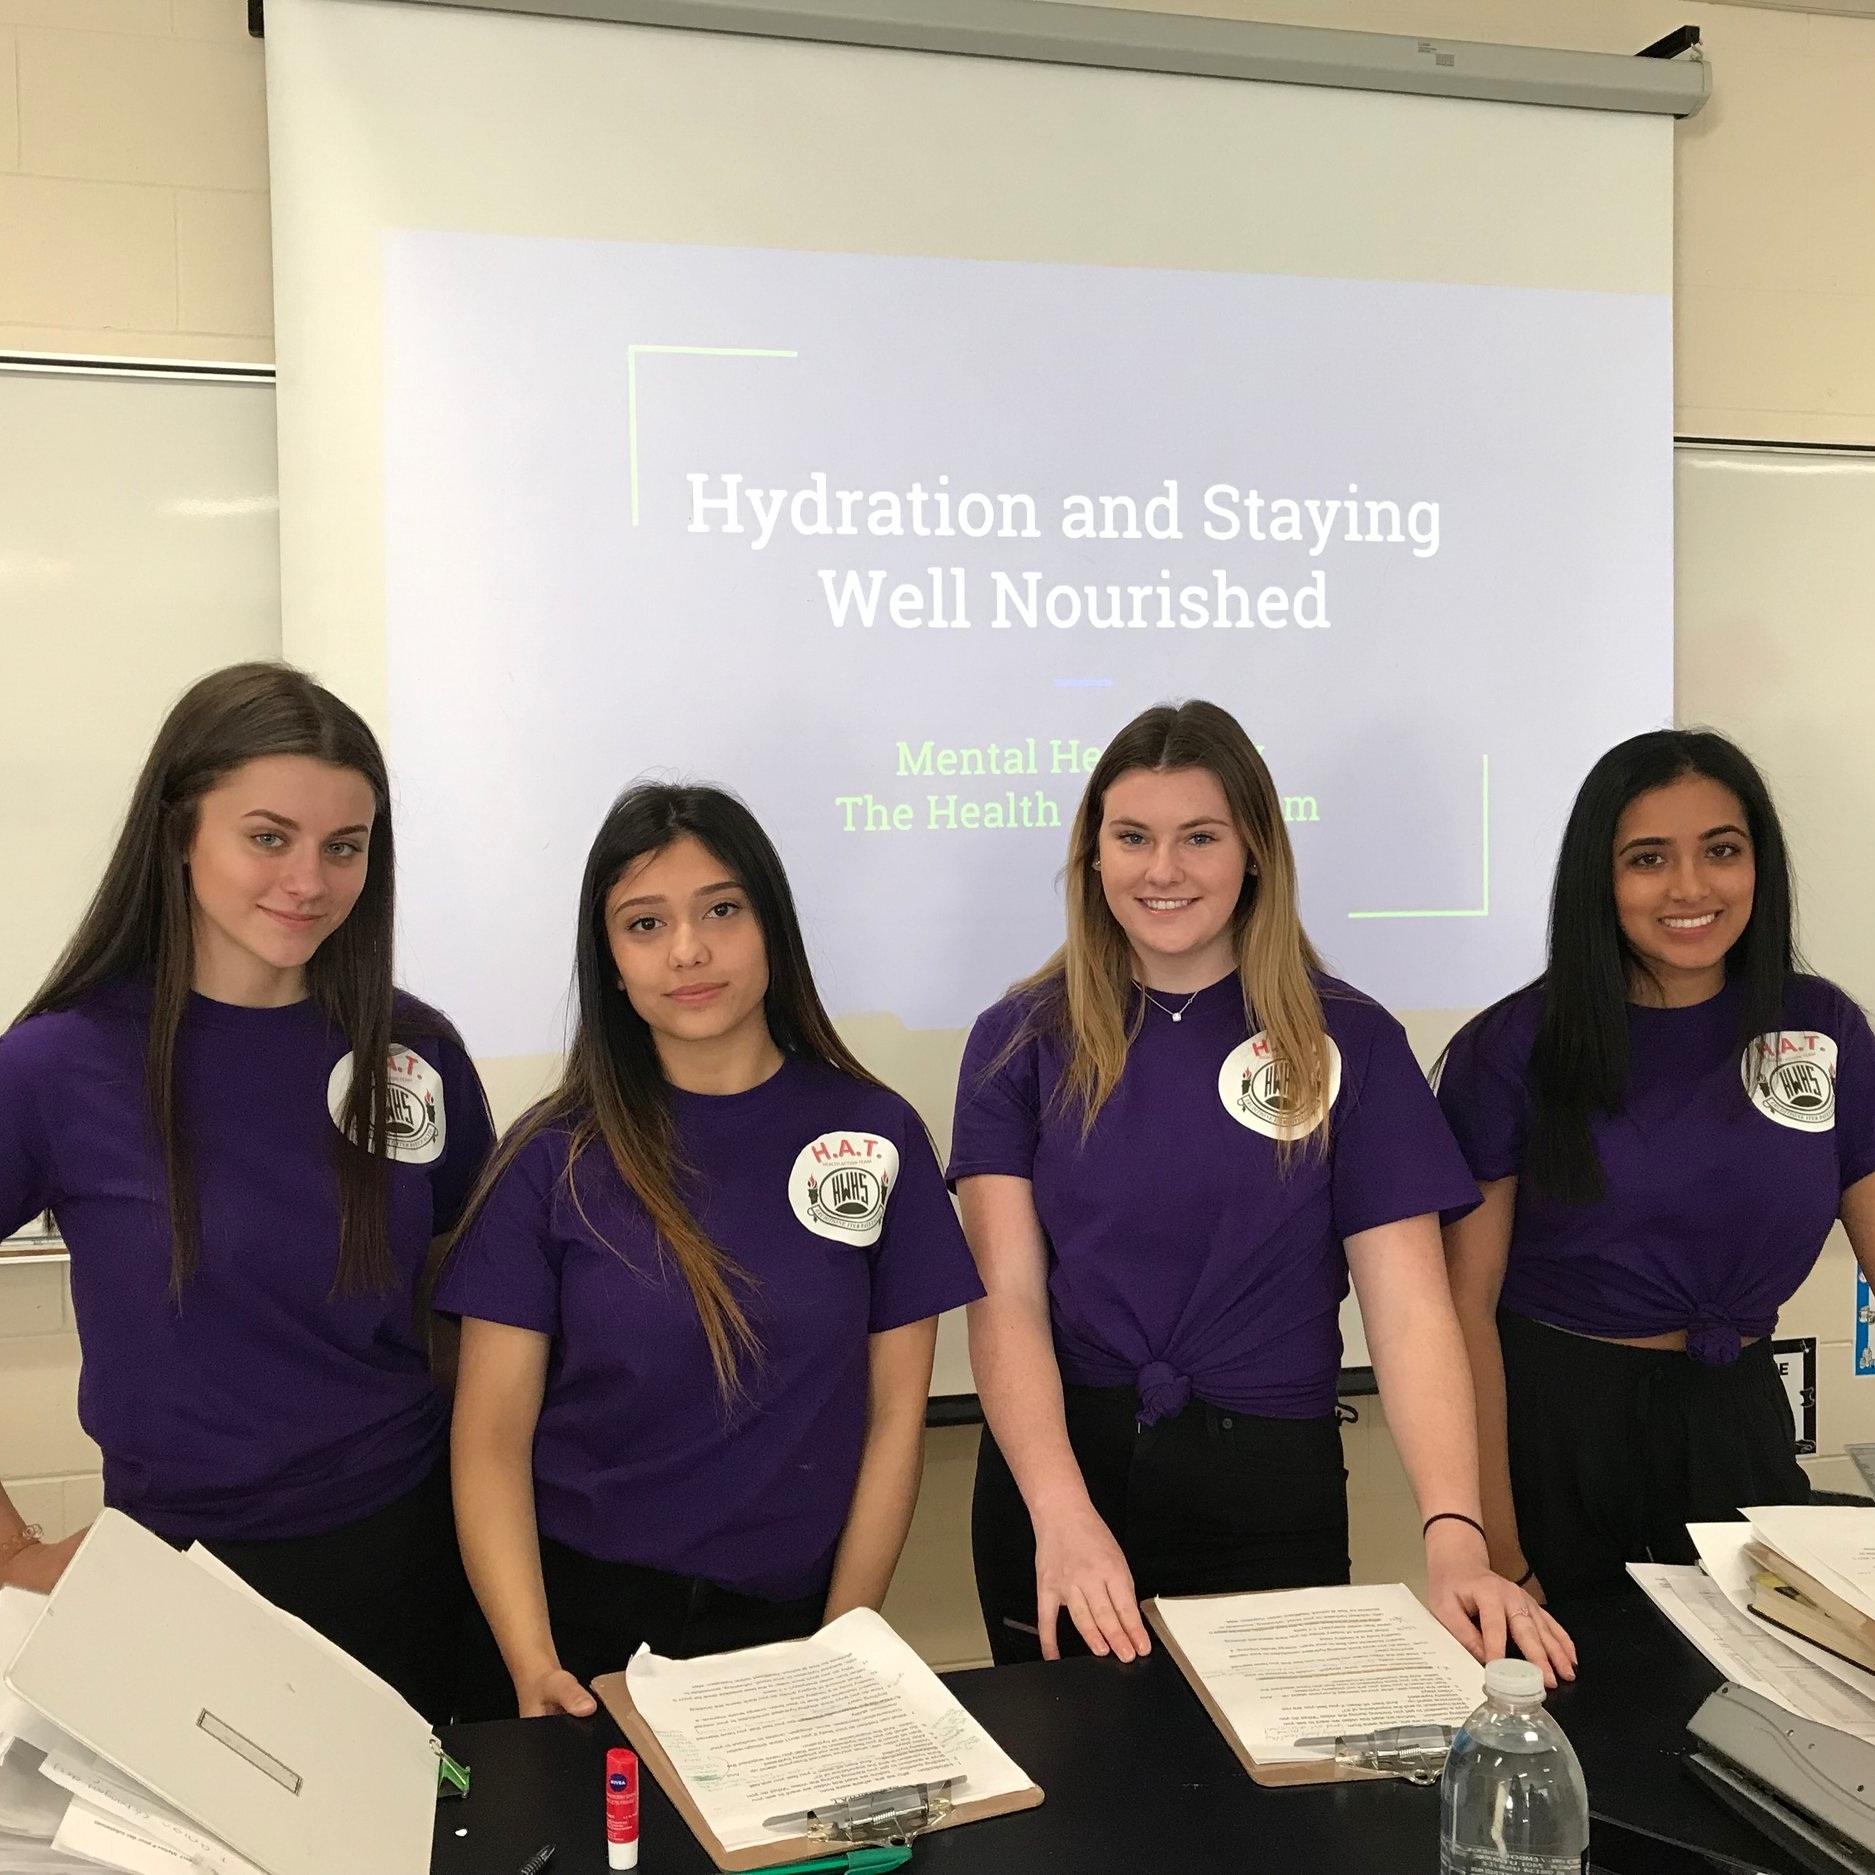 Halifax+West+Health+Action+Team+Students+-+Hydration.jpg